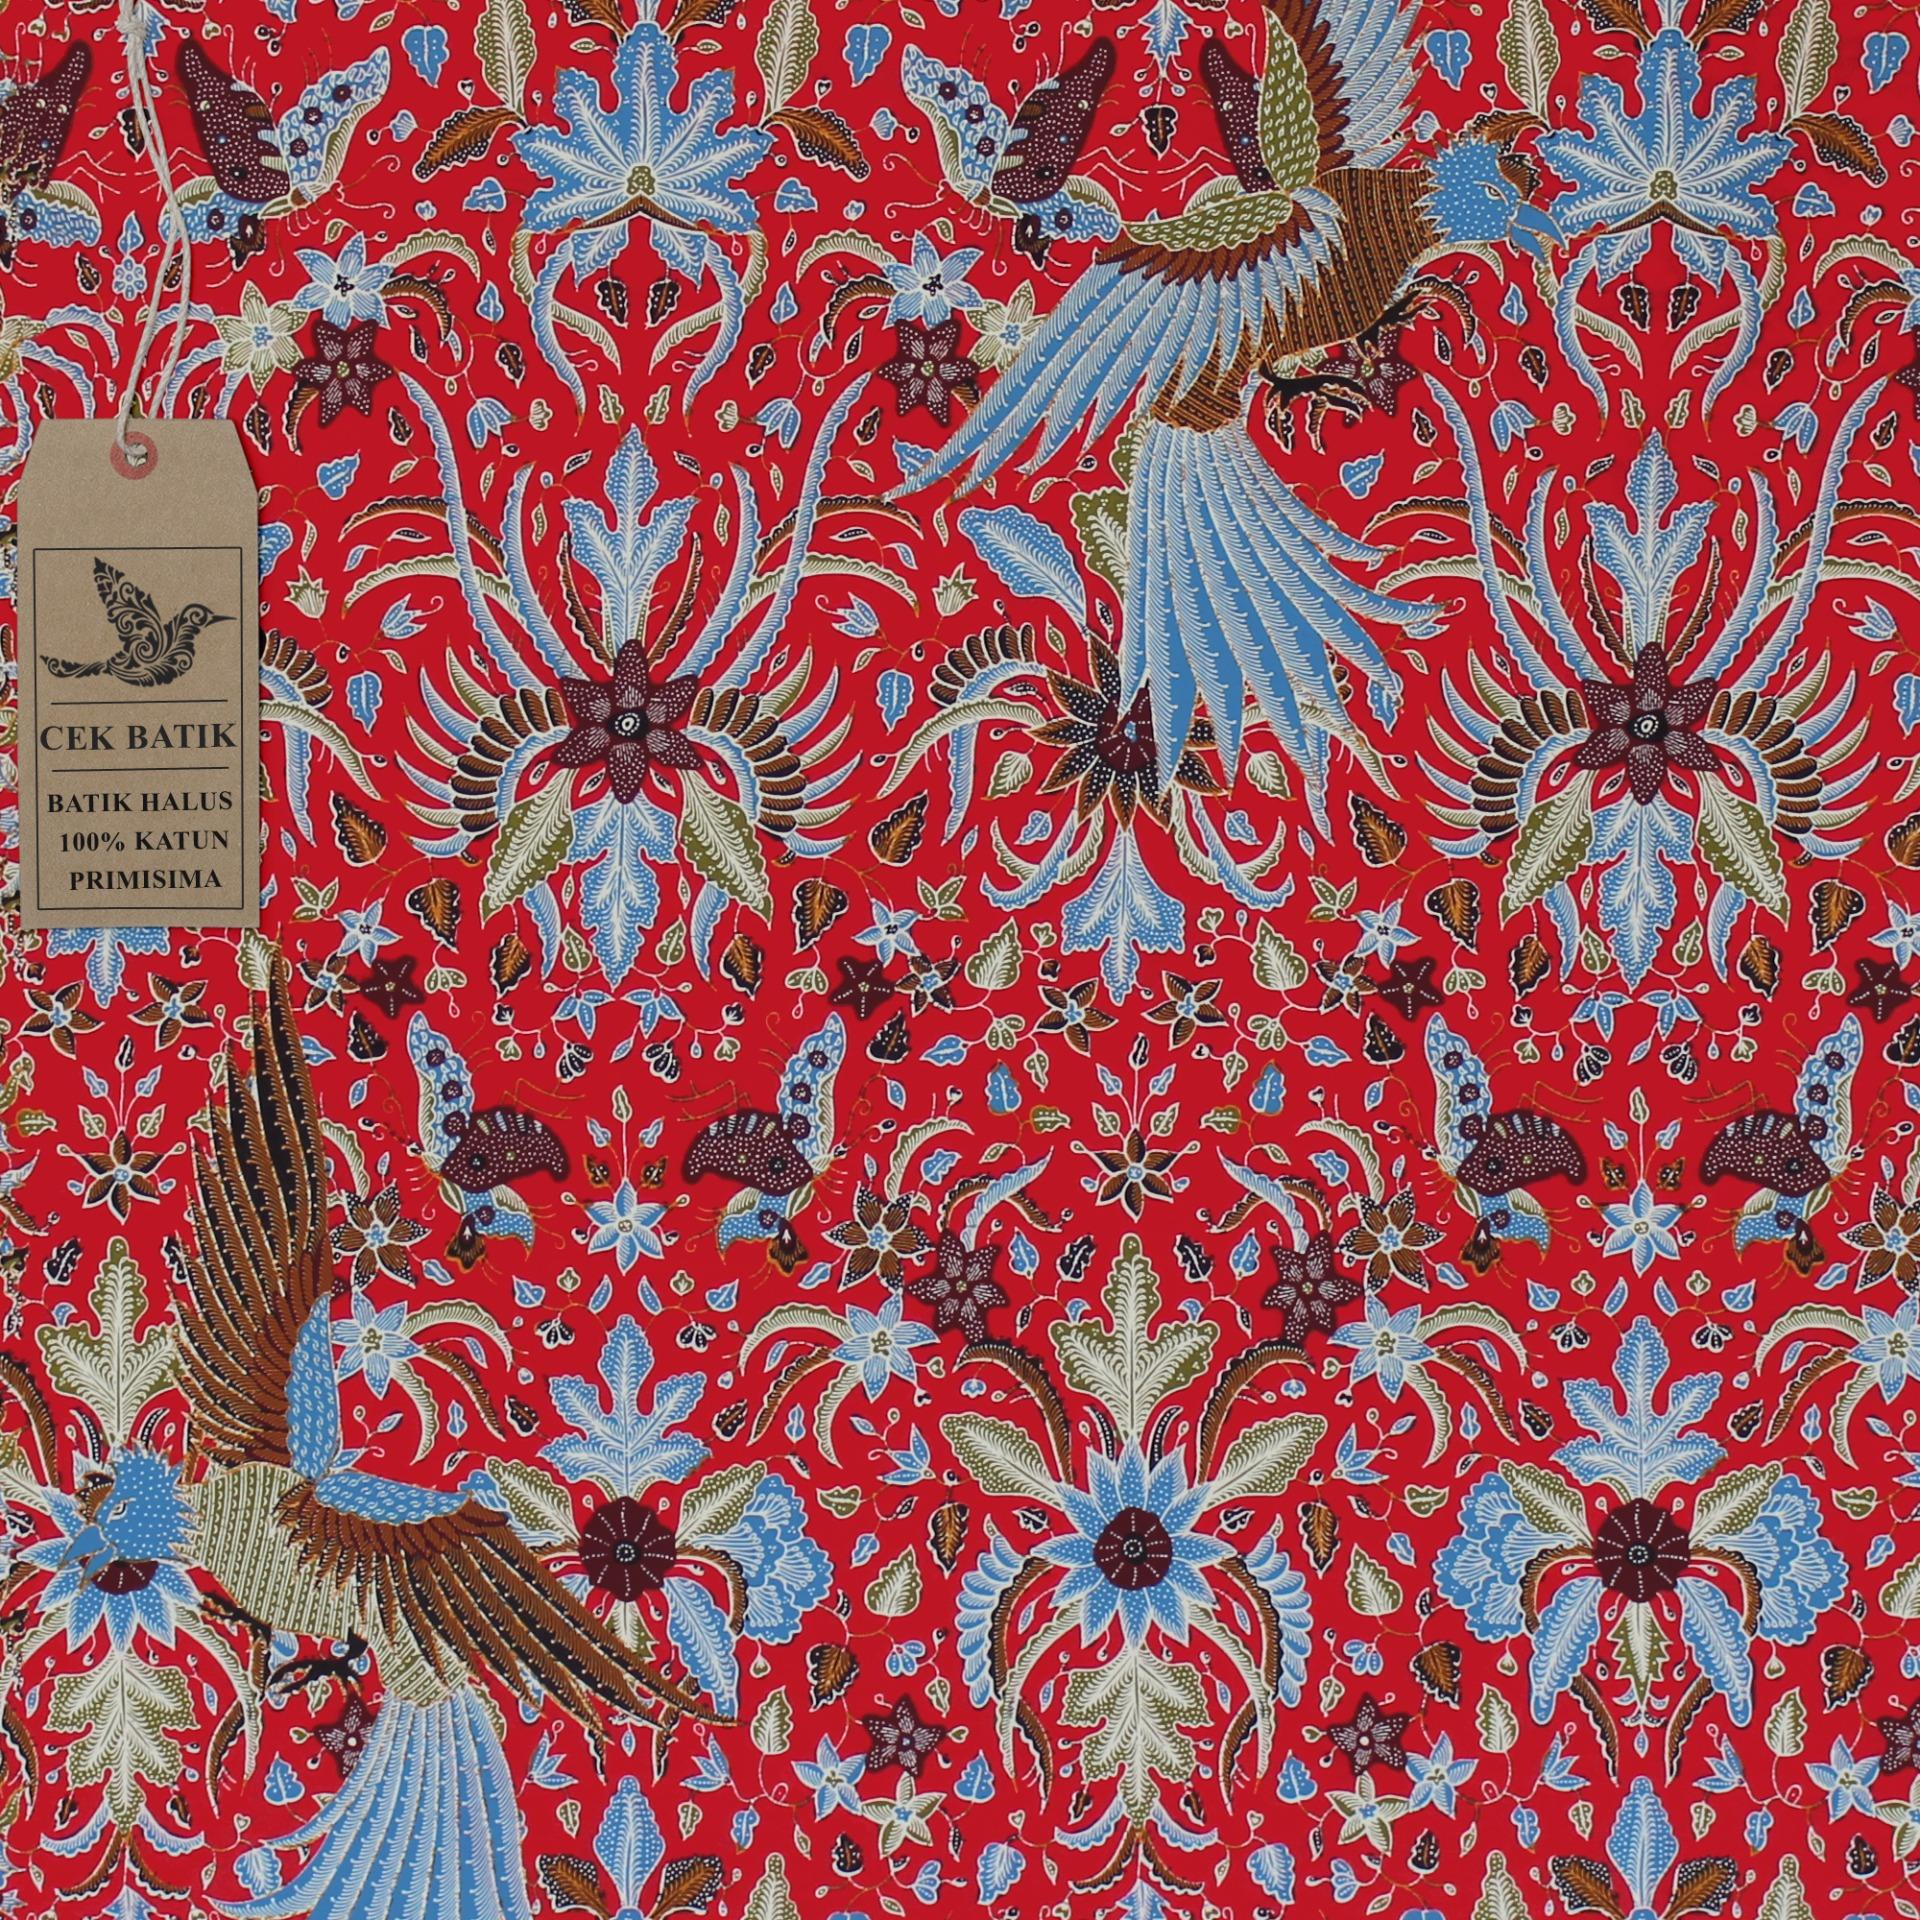 Cek Batik - Kain Batik Motif Garuda Indonesia Favorit Presiden Jokowi (Merah Manis)